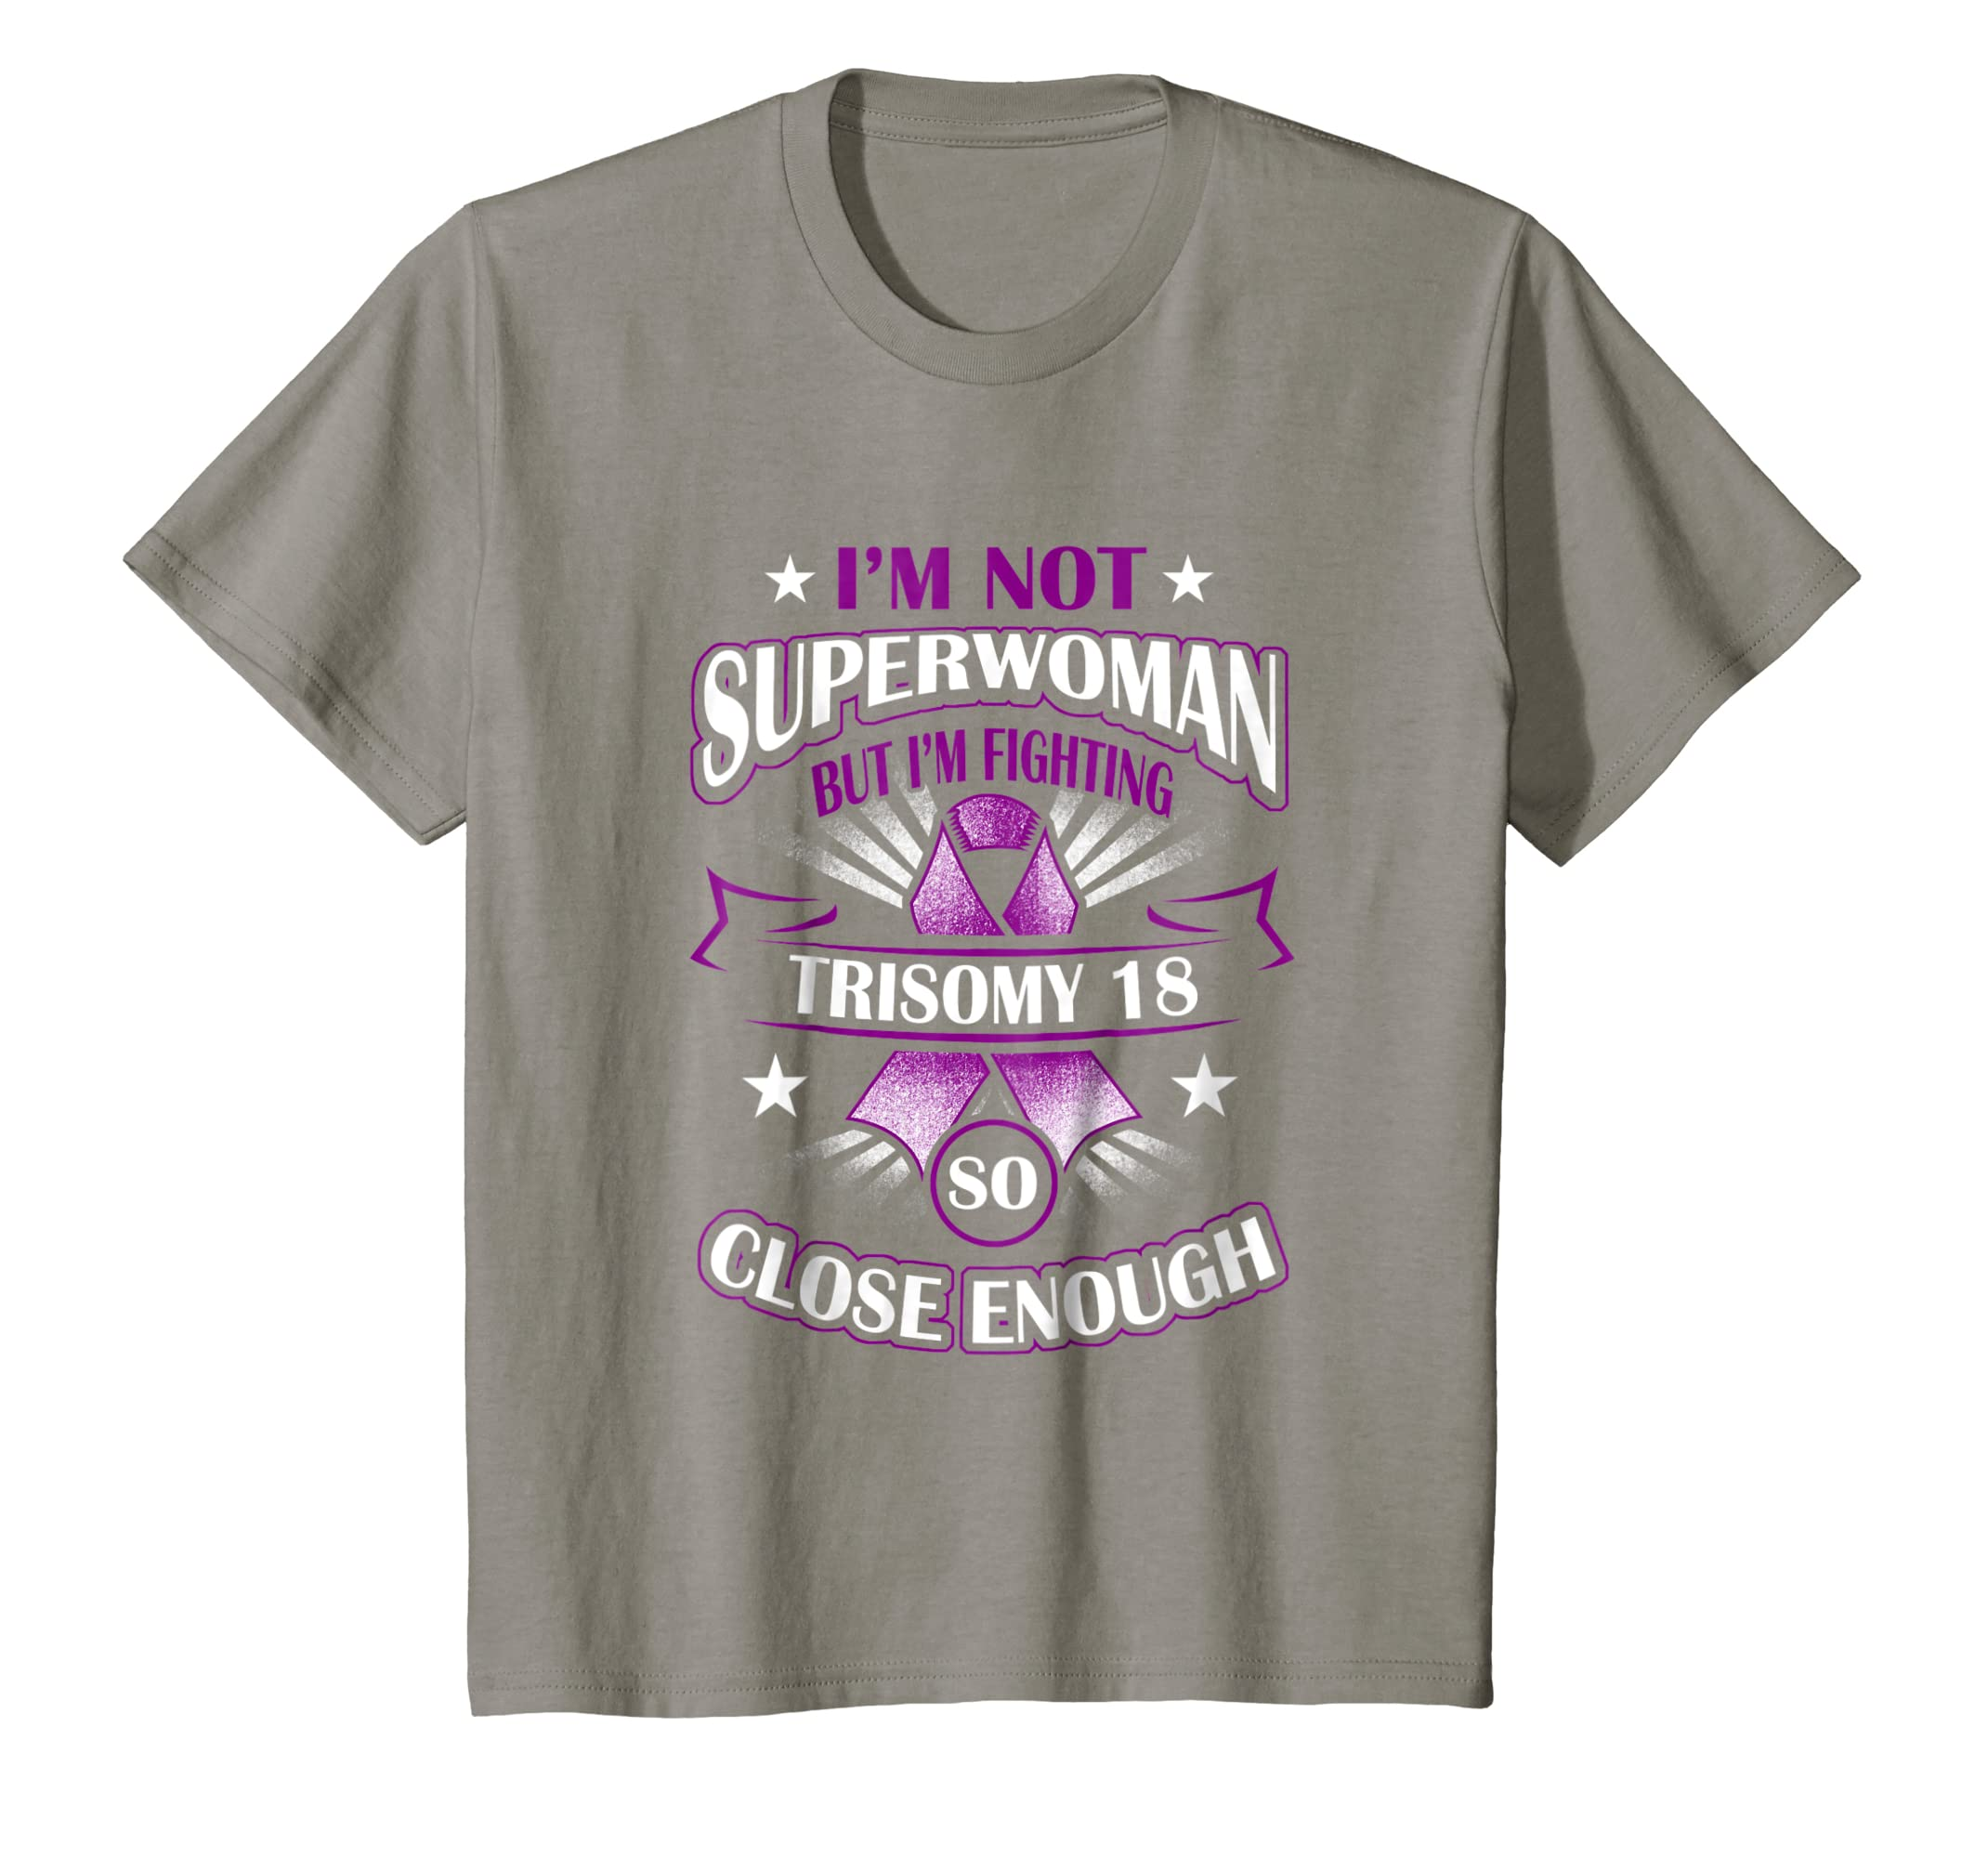 53fde53fa Amazon.com: Trisomy 18 Awareness T Shirt For Women: Clothing